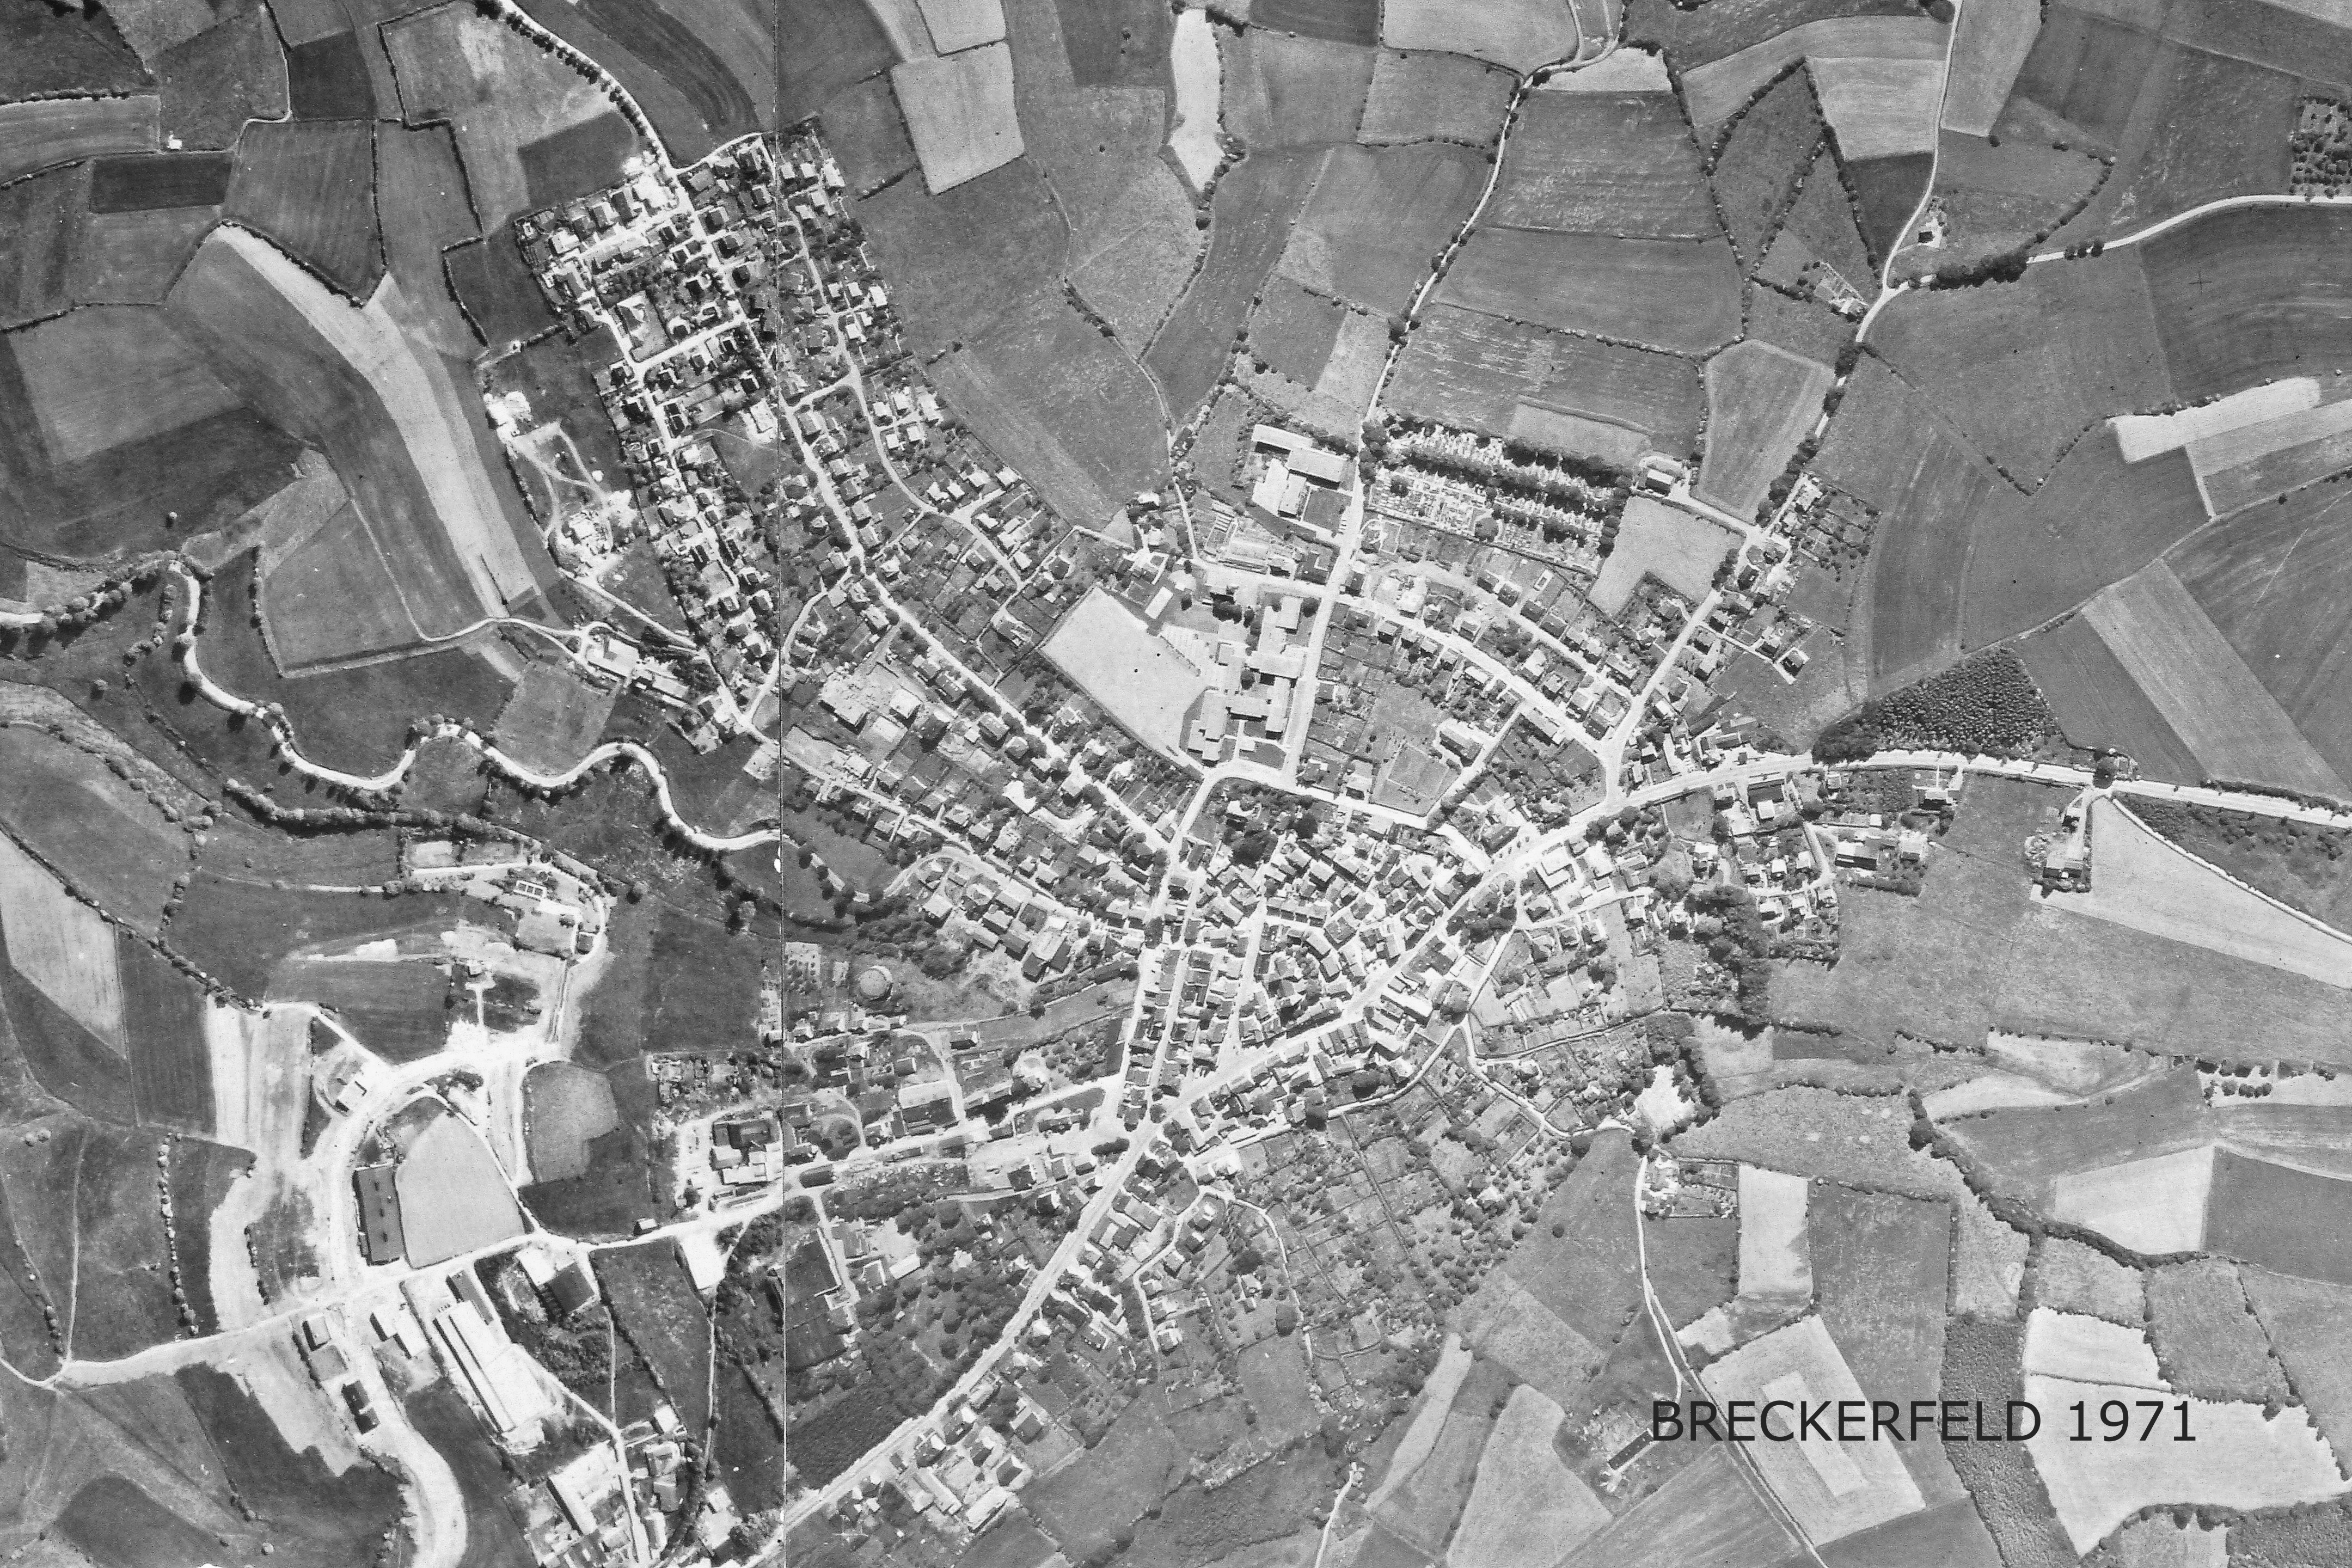 Breckerfeld 007.3